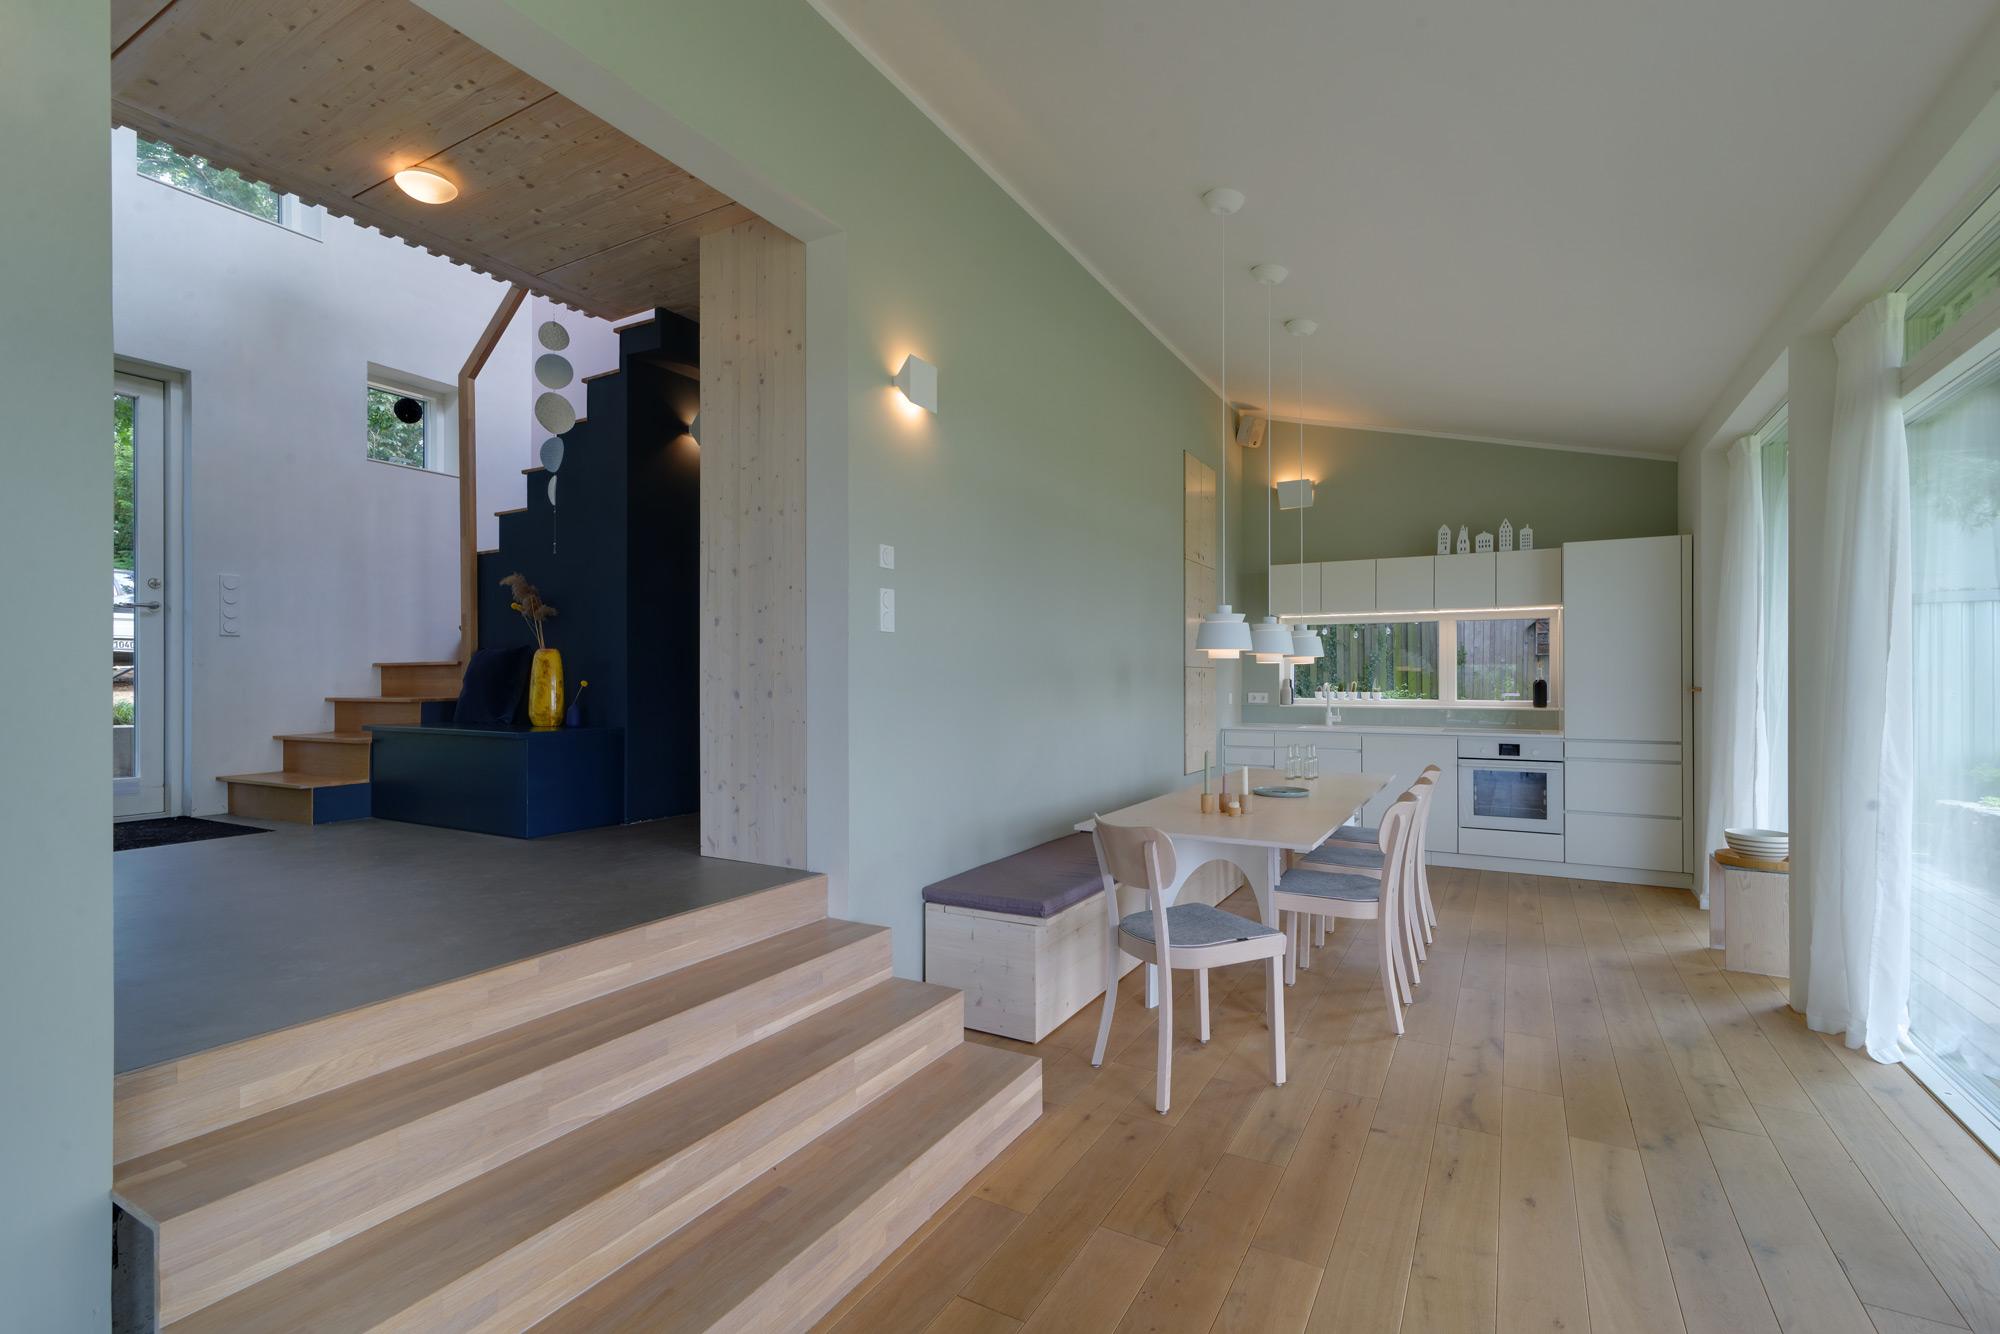 HK3a, Neubau eines Ferienhauses, 2016-2018, realisiert